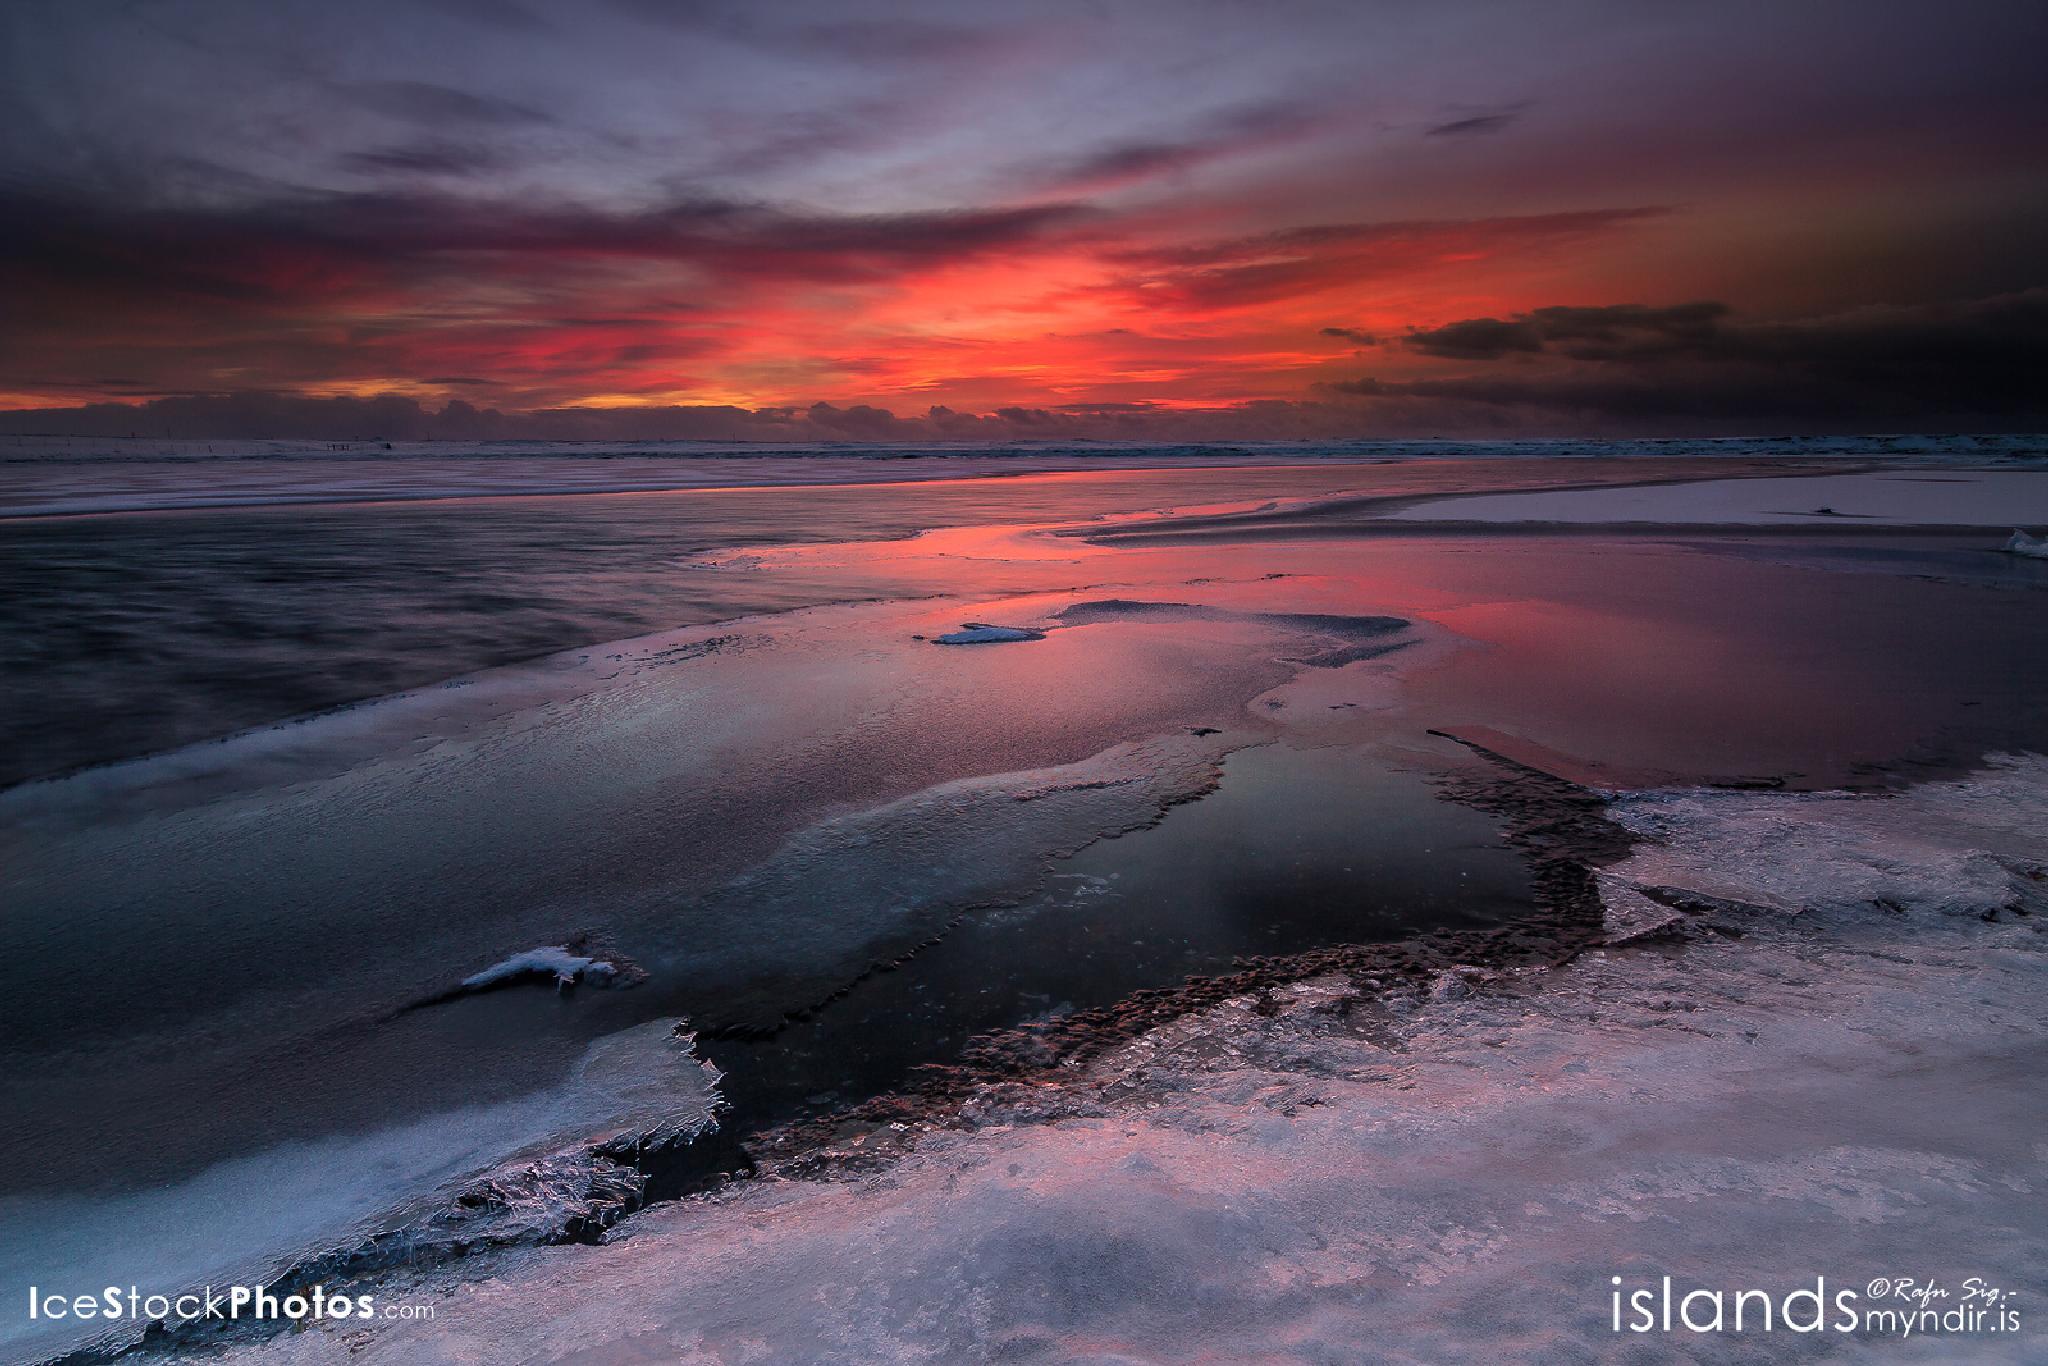 Daybreak - #Iceland by Rafn Sig,-  @ Discover Wild Iceland.com